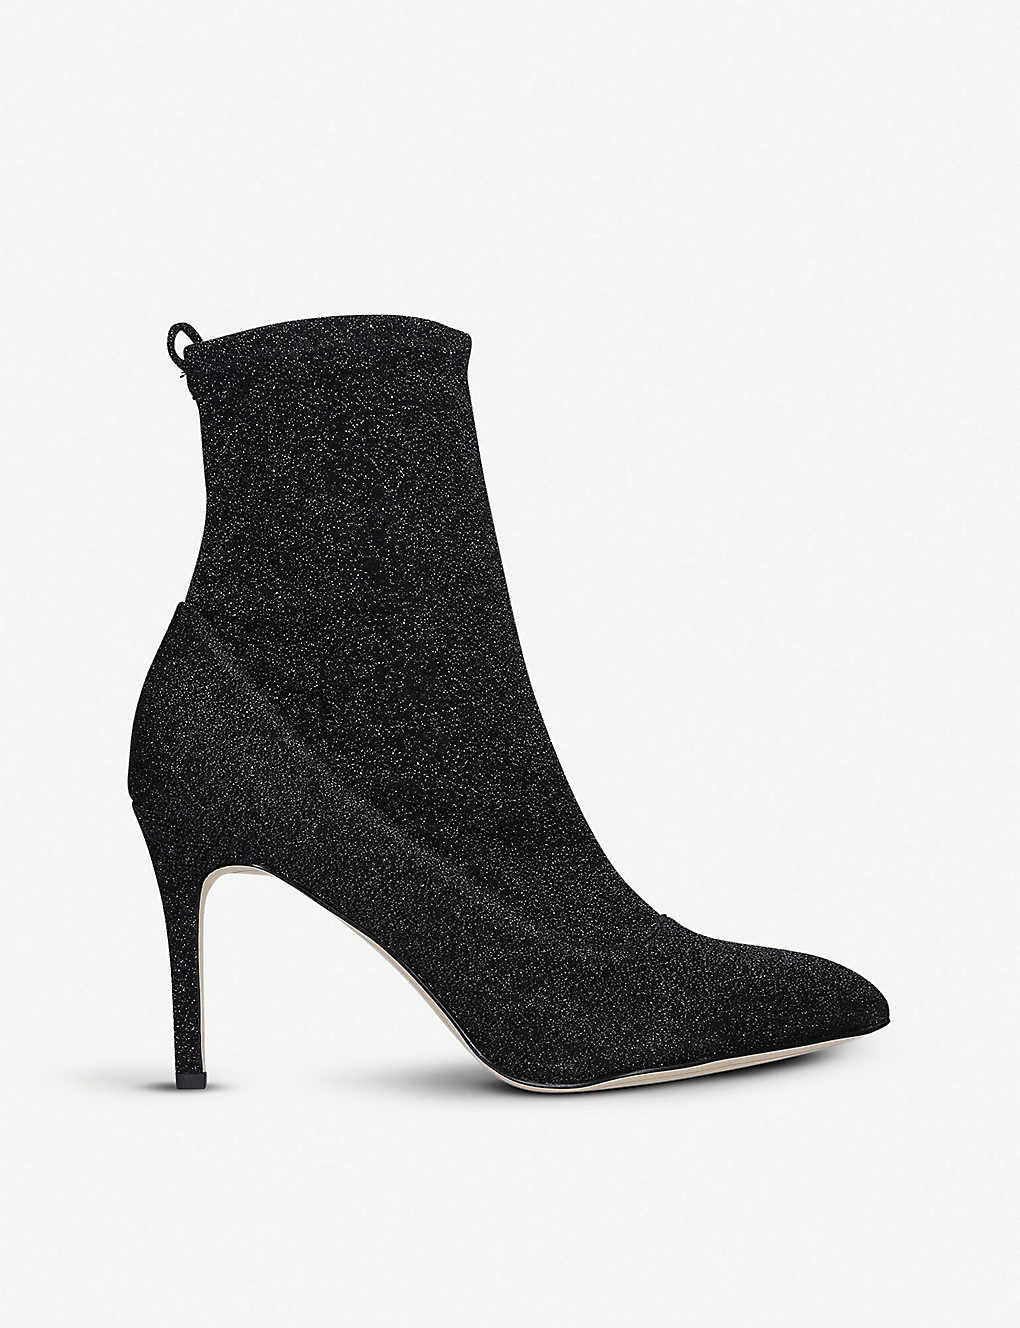 8b4da63c9df1 SAM EDELMAN - Olson metallic-knit sock boots